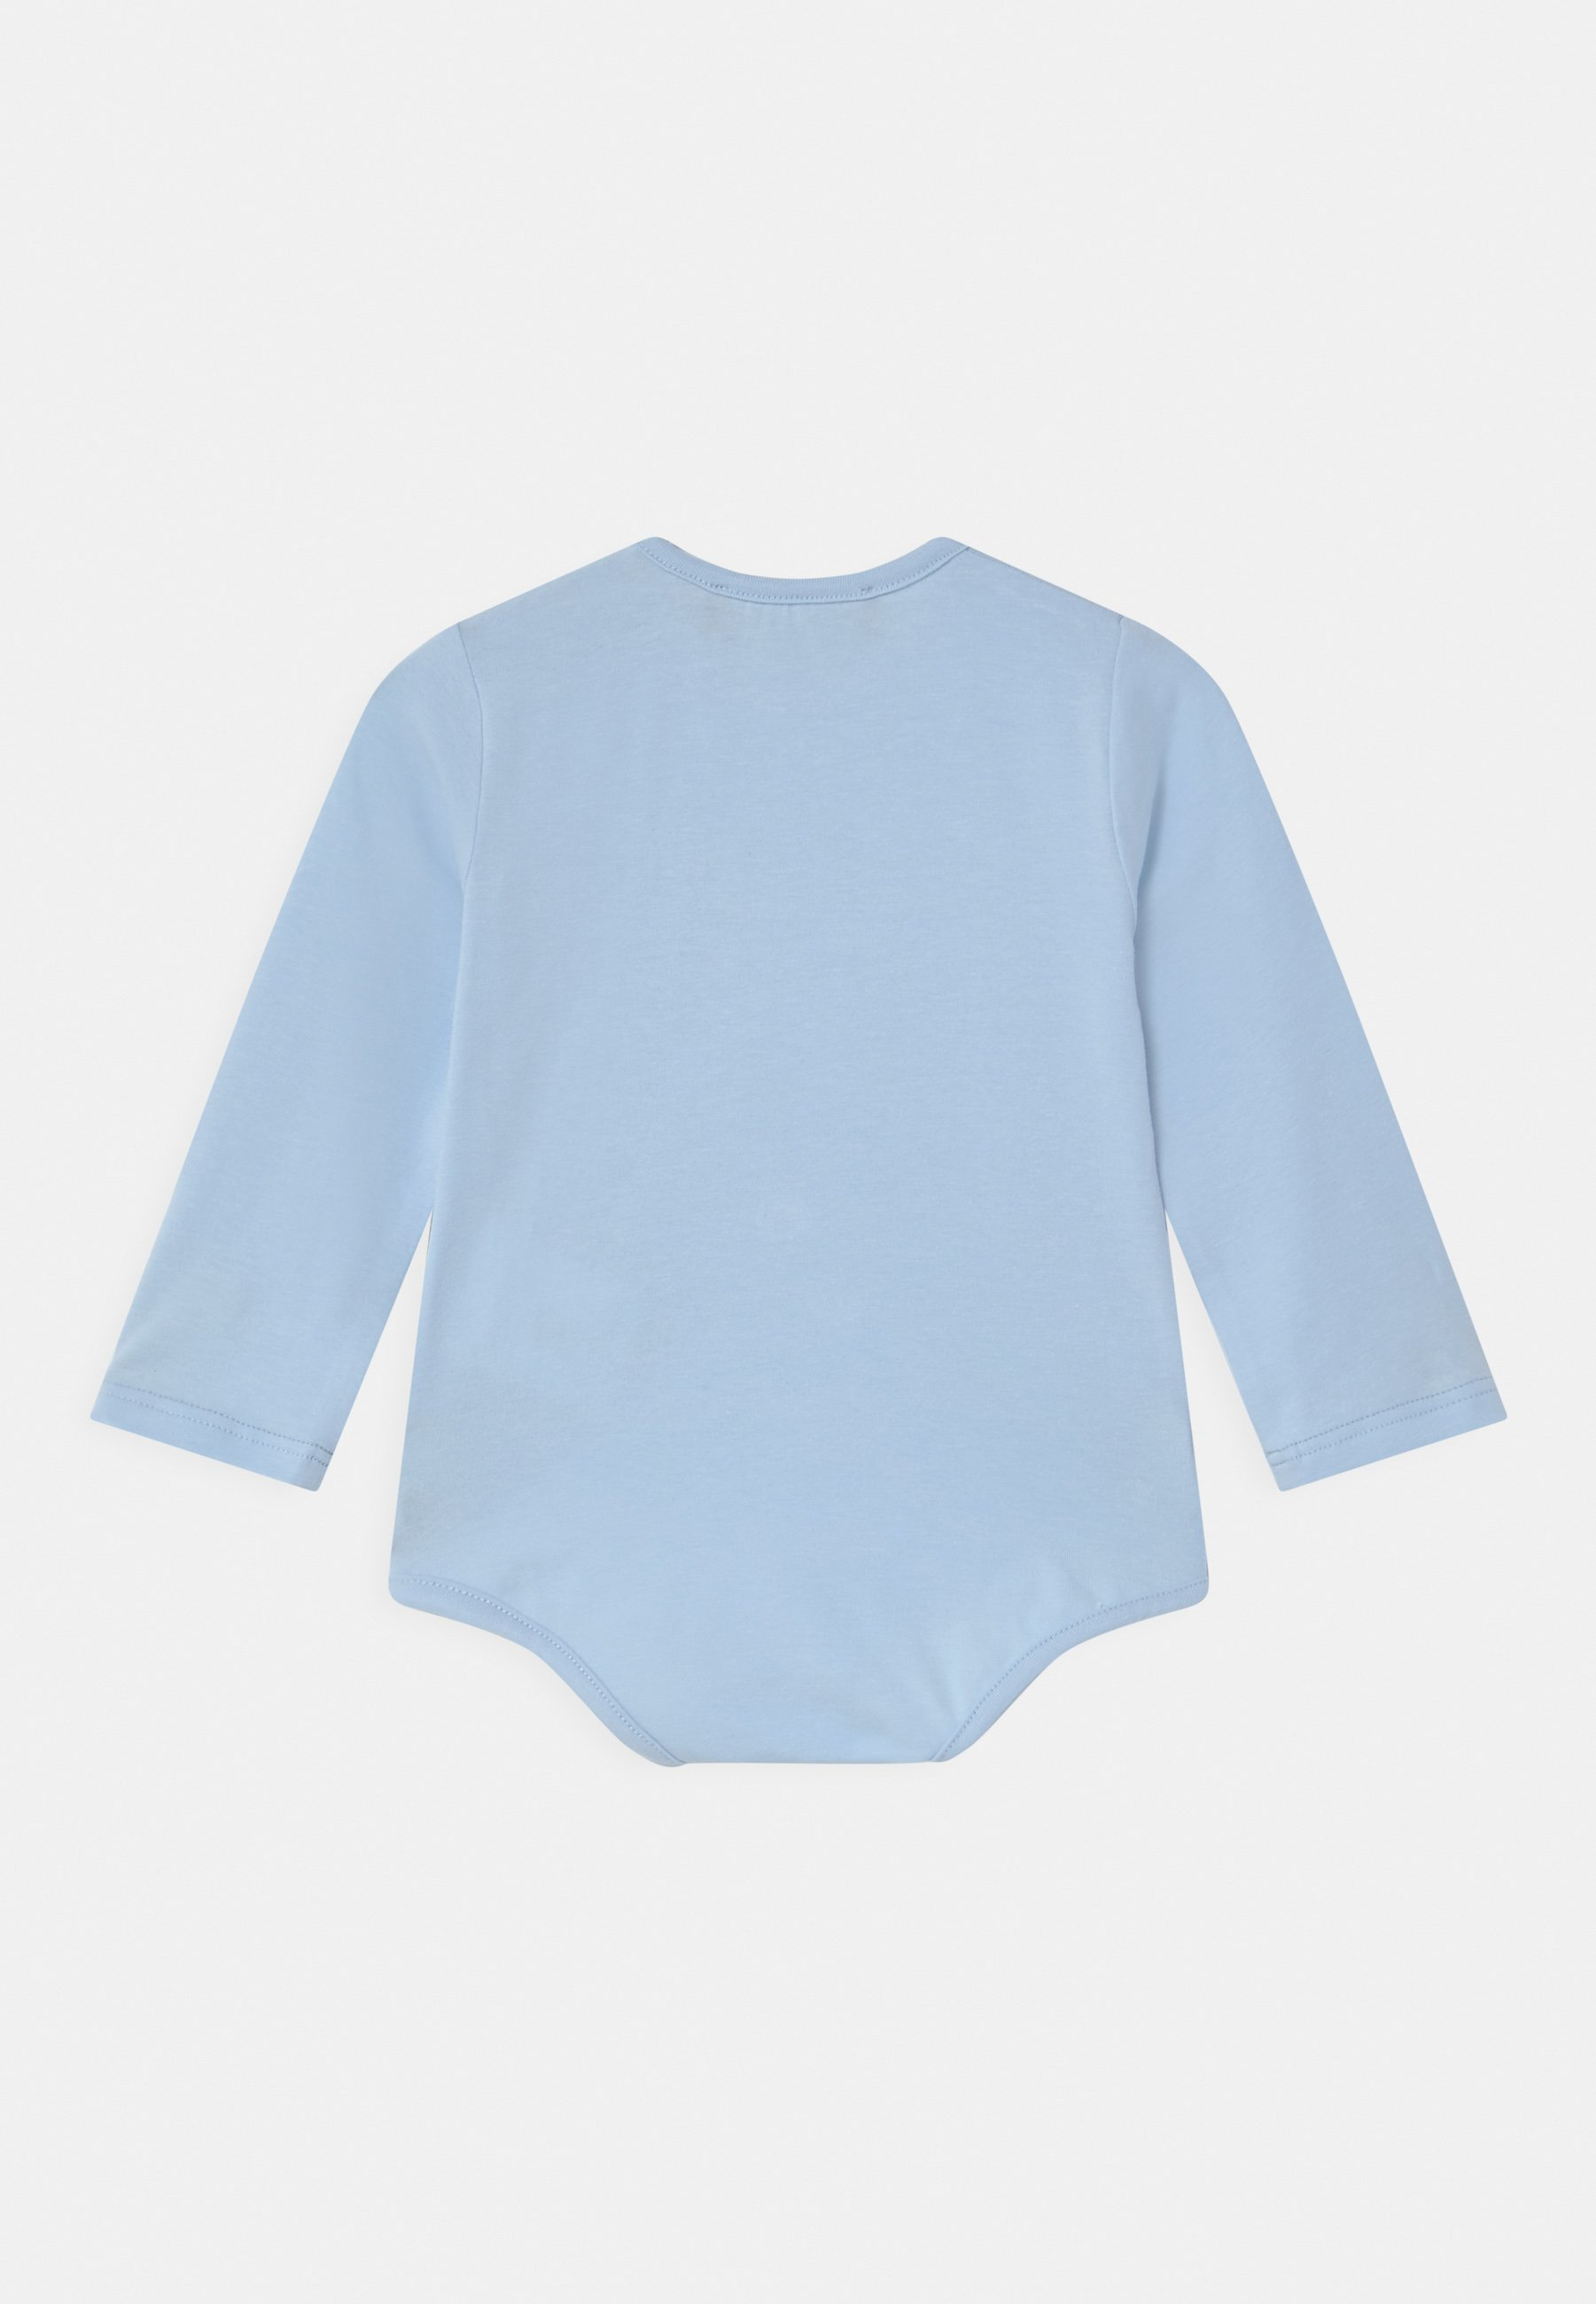 Kids PRINT SIGNATURE LOGO 3 PACK UNISEX - Baby gifts